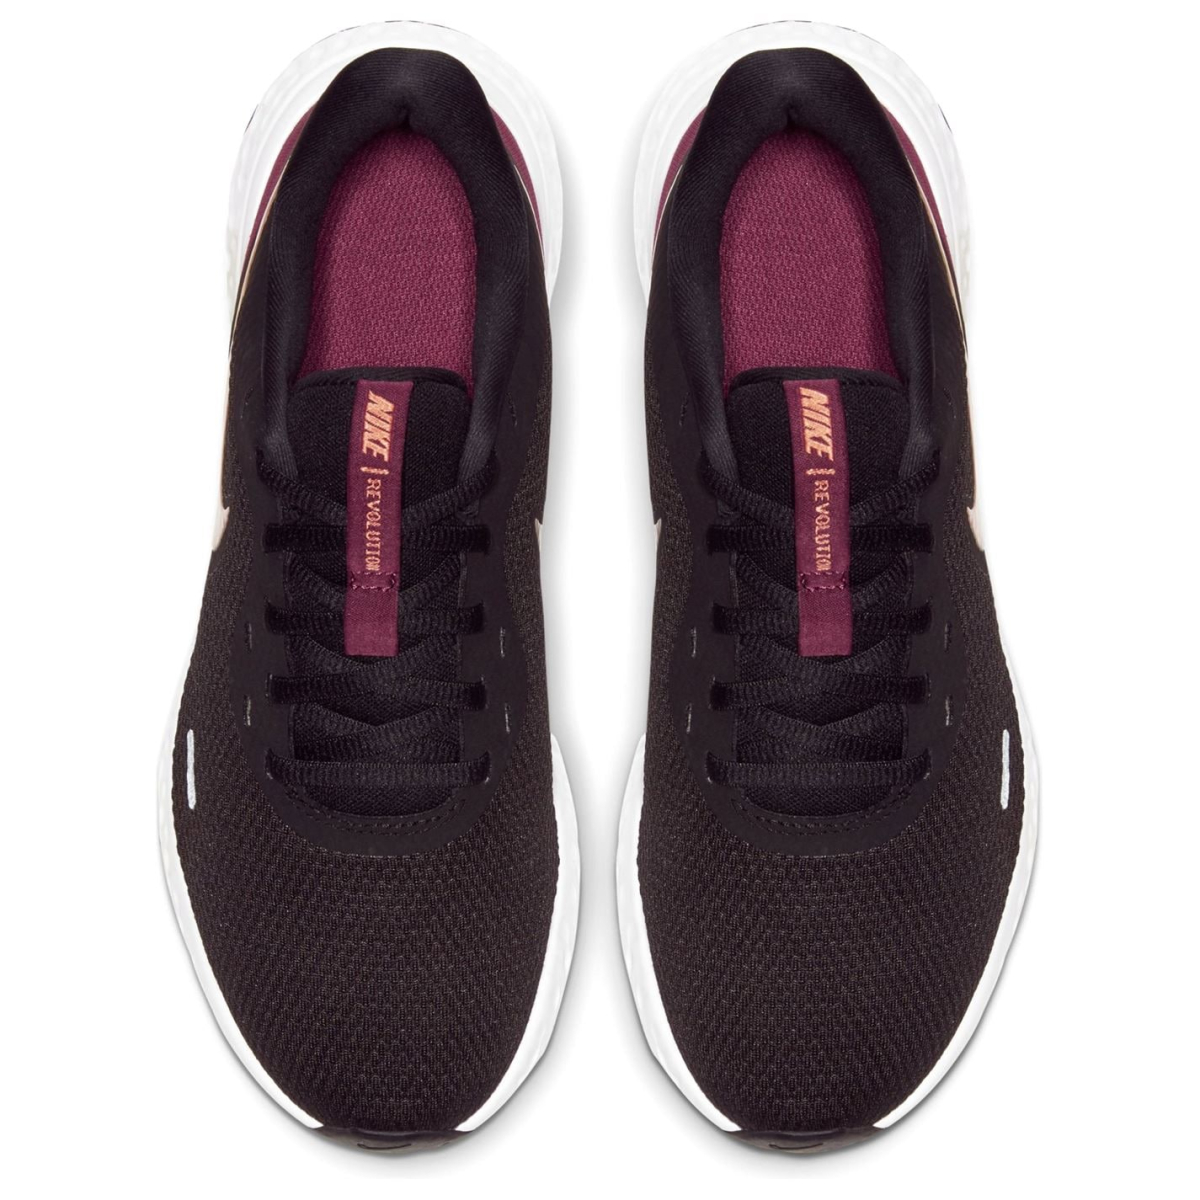 Nike-Revolution-Turnschuhe-Damen-Sneaker-Sportschuhe-Laufschuhe-1160 Indexbild 8